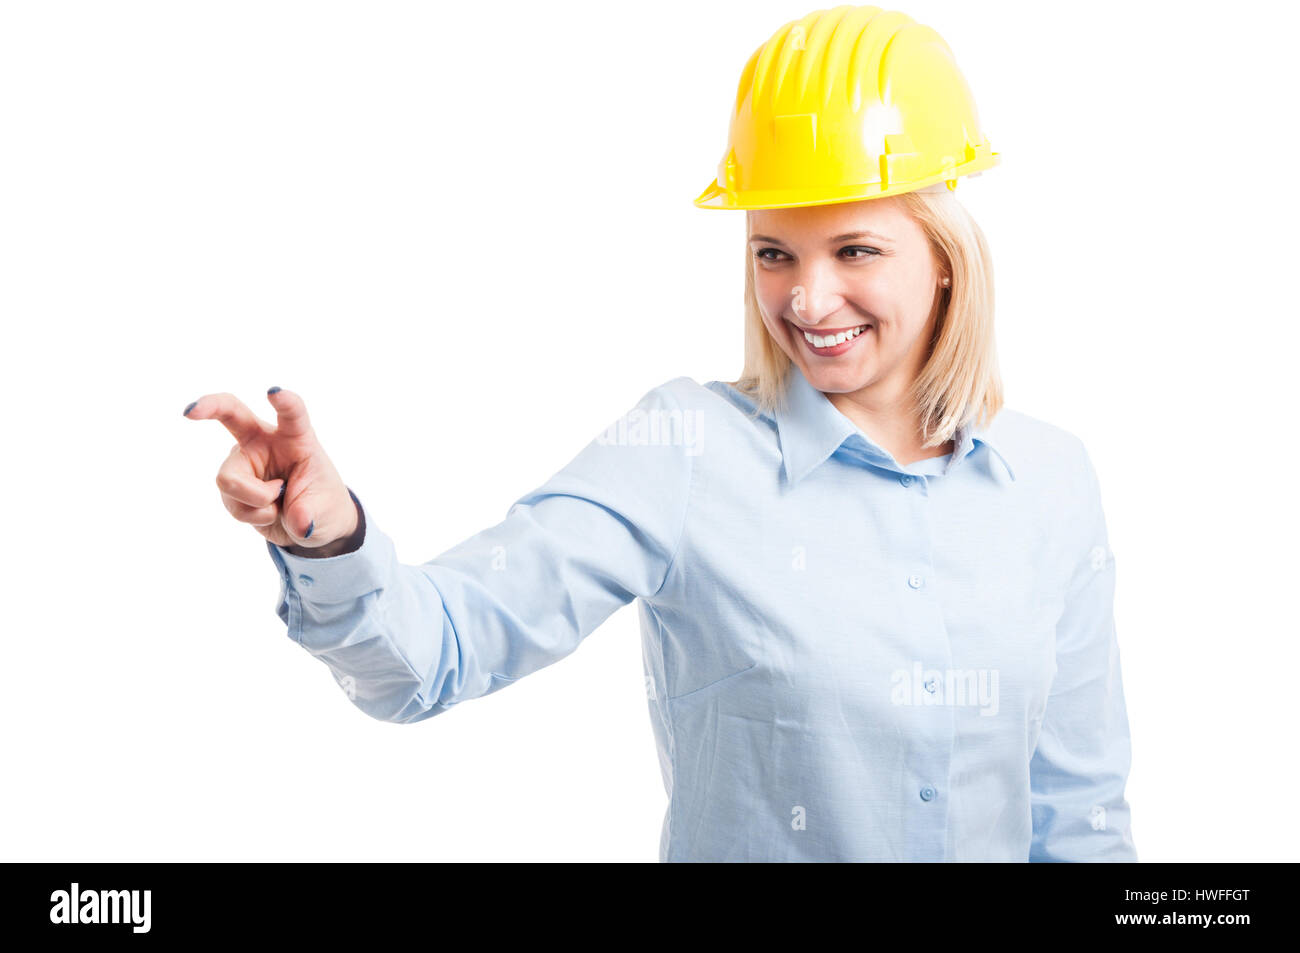 Female engineer wearing helmet using touchscreen copypsace isolated on white background - Stock Image